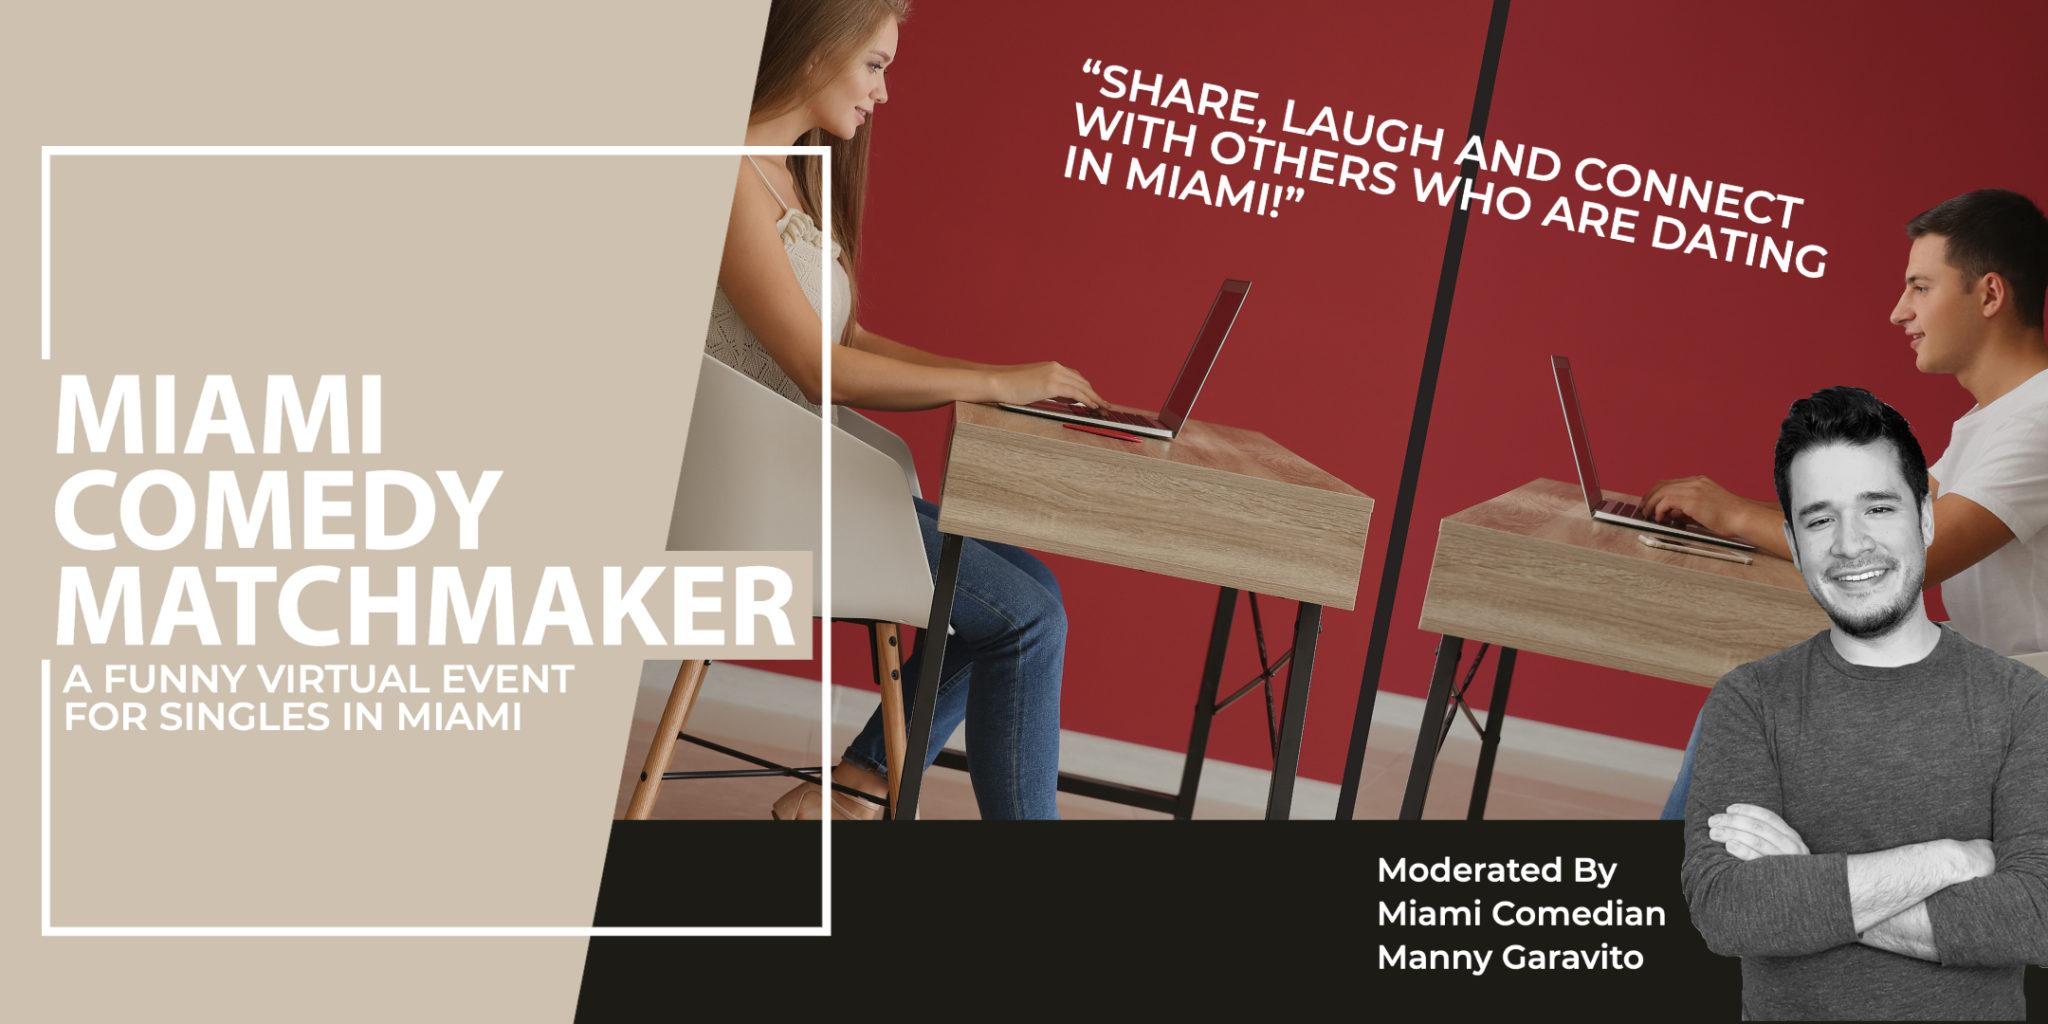 Miami Comedy Matchmaker